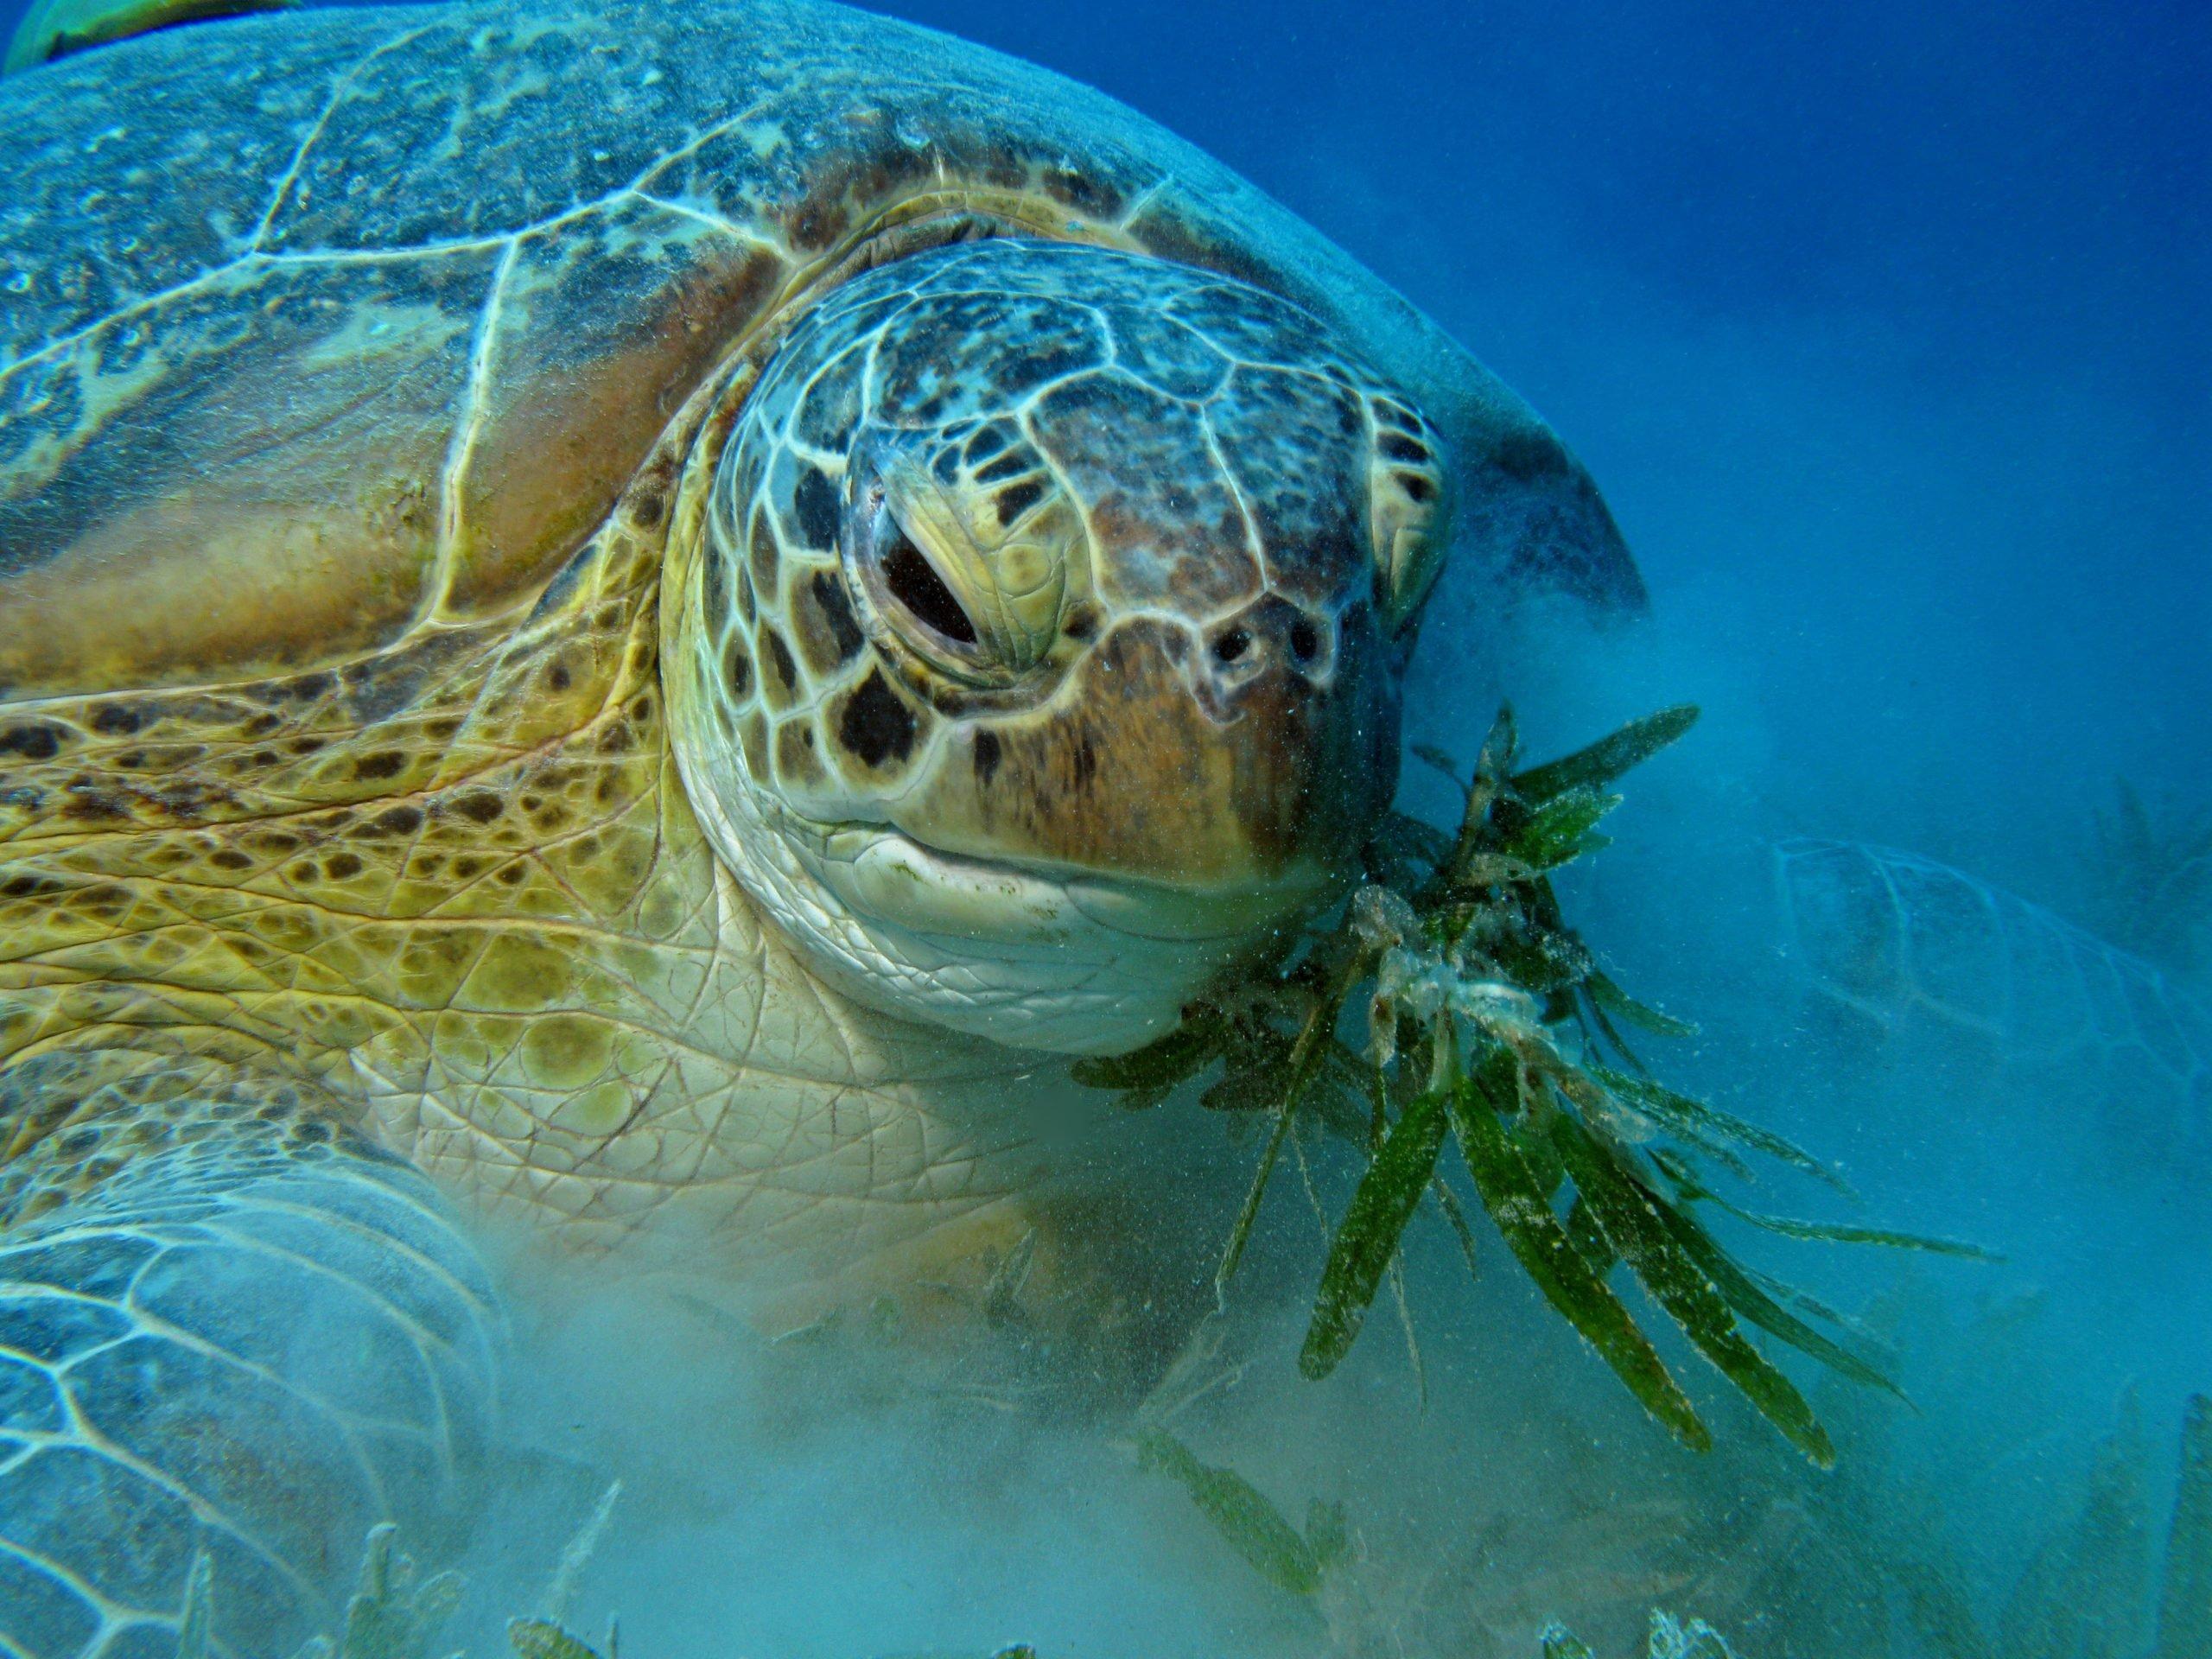 adult green turtles enjoy seagrass